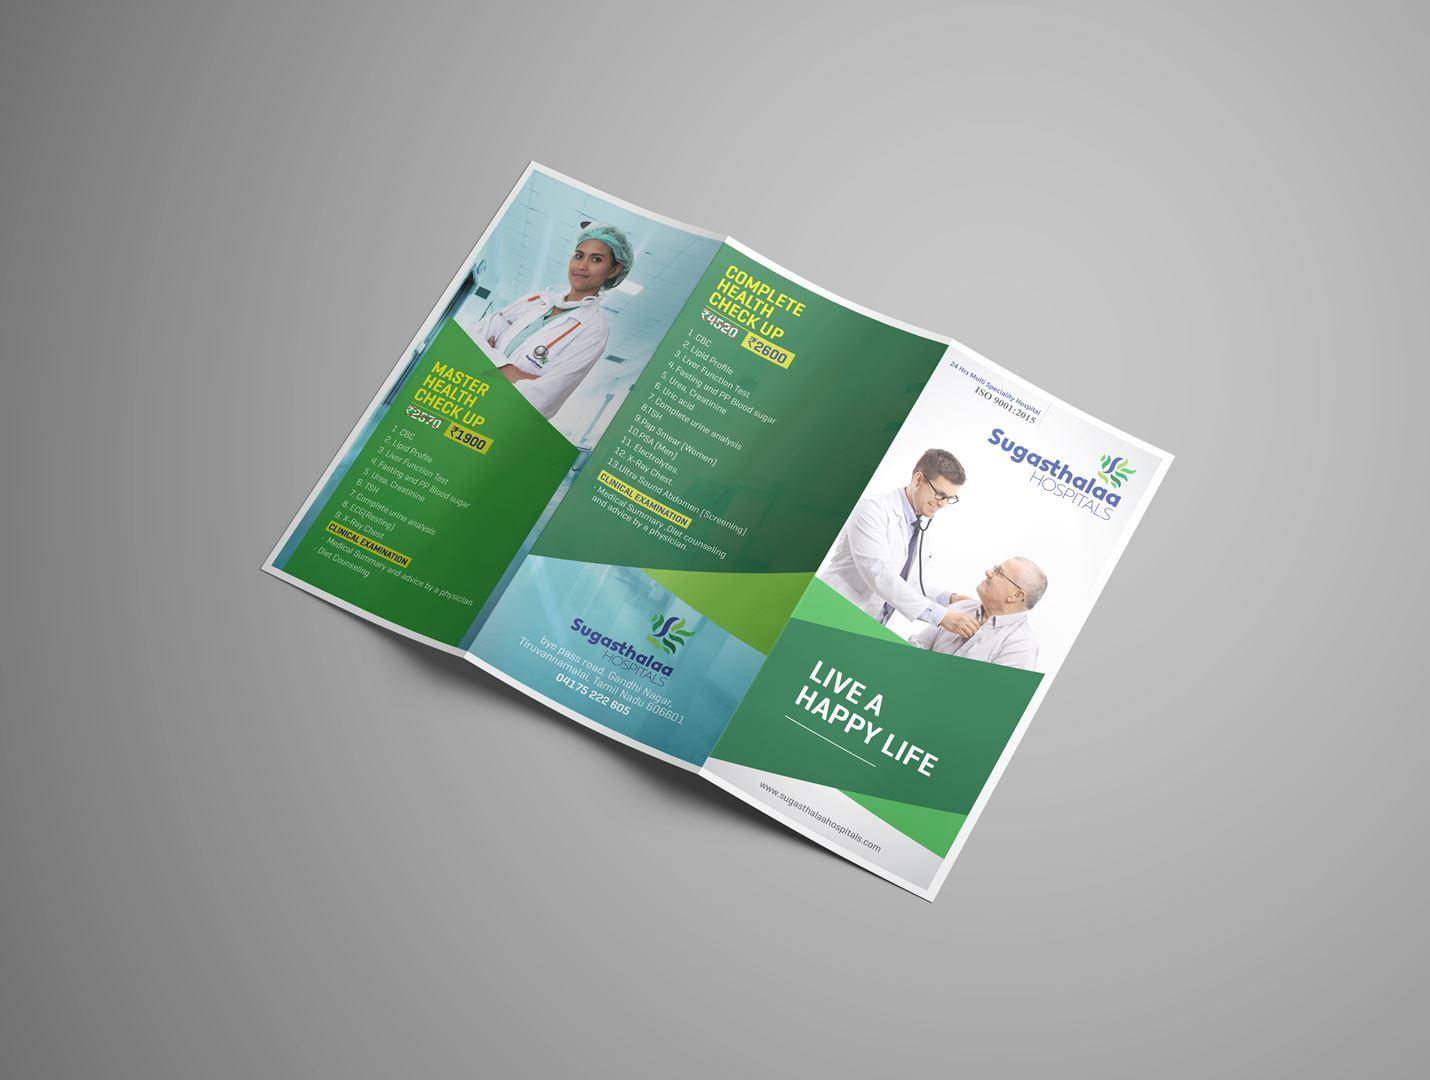 05-infinarts-graphic-design-agency-in-chennai